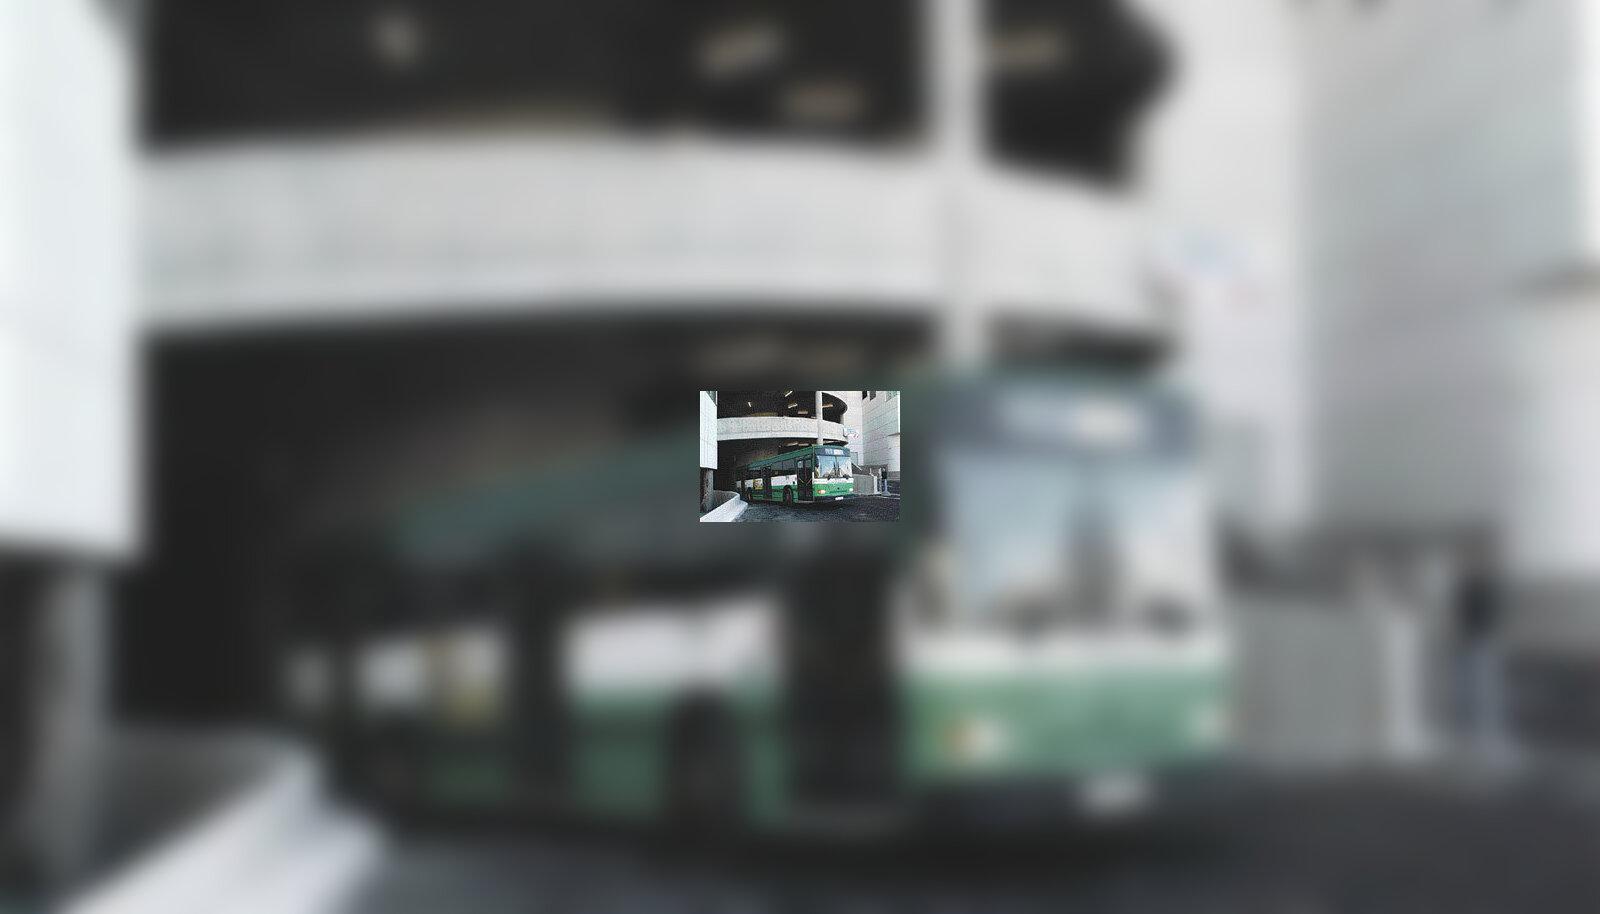 e70a37e707b Viru keskuse bussiterminal vajab vastu talve remonti